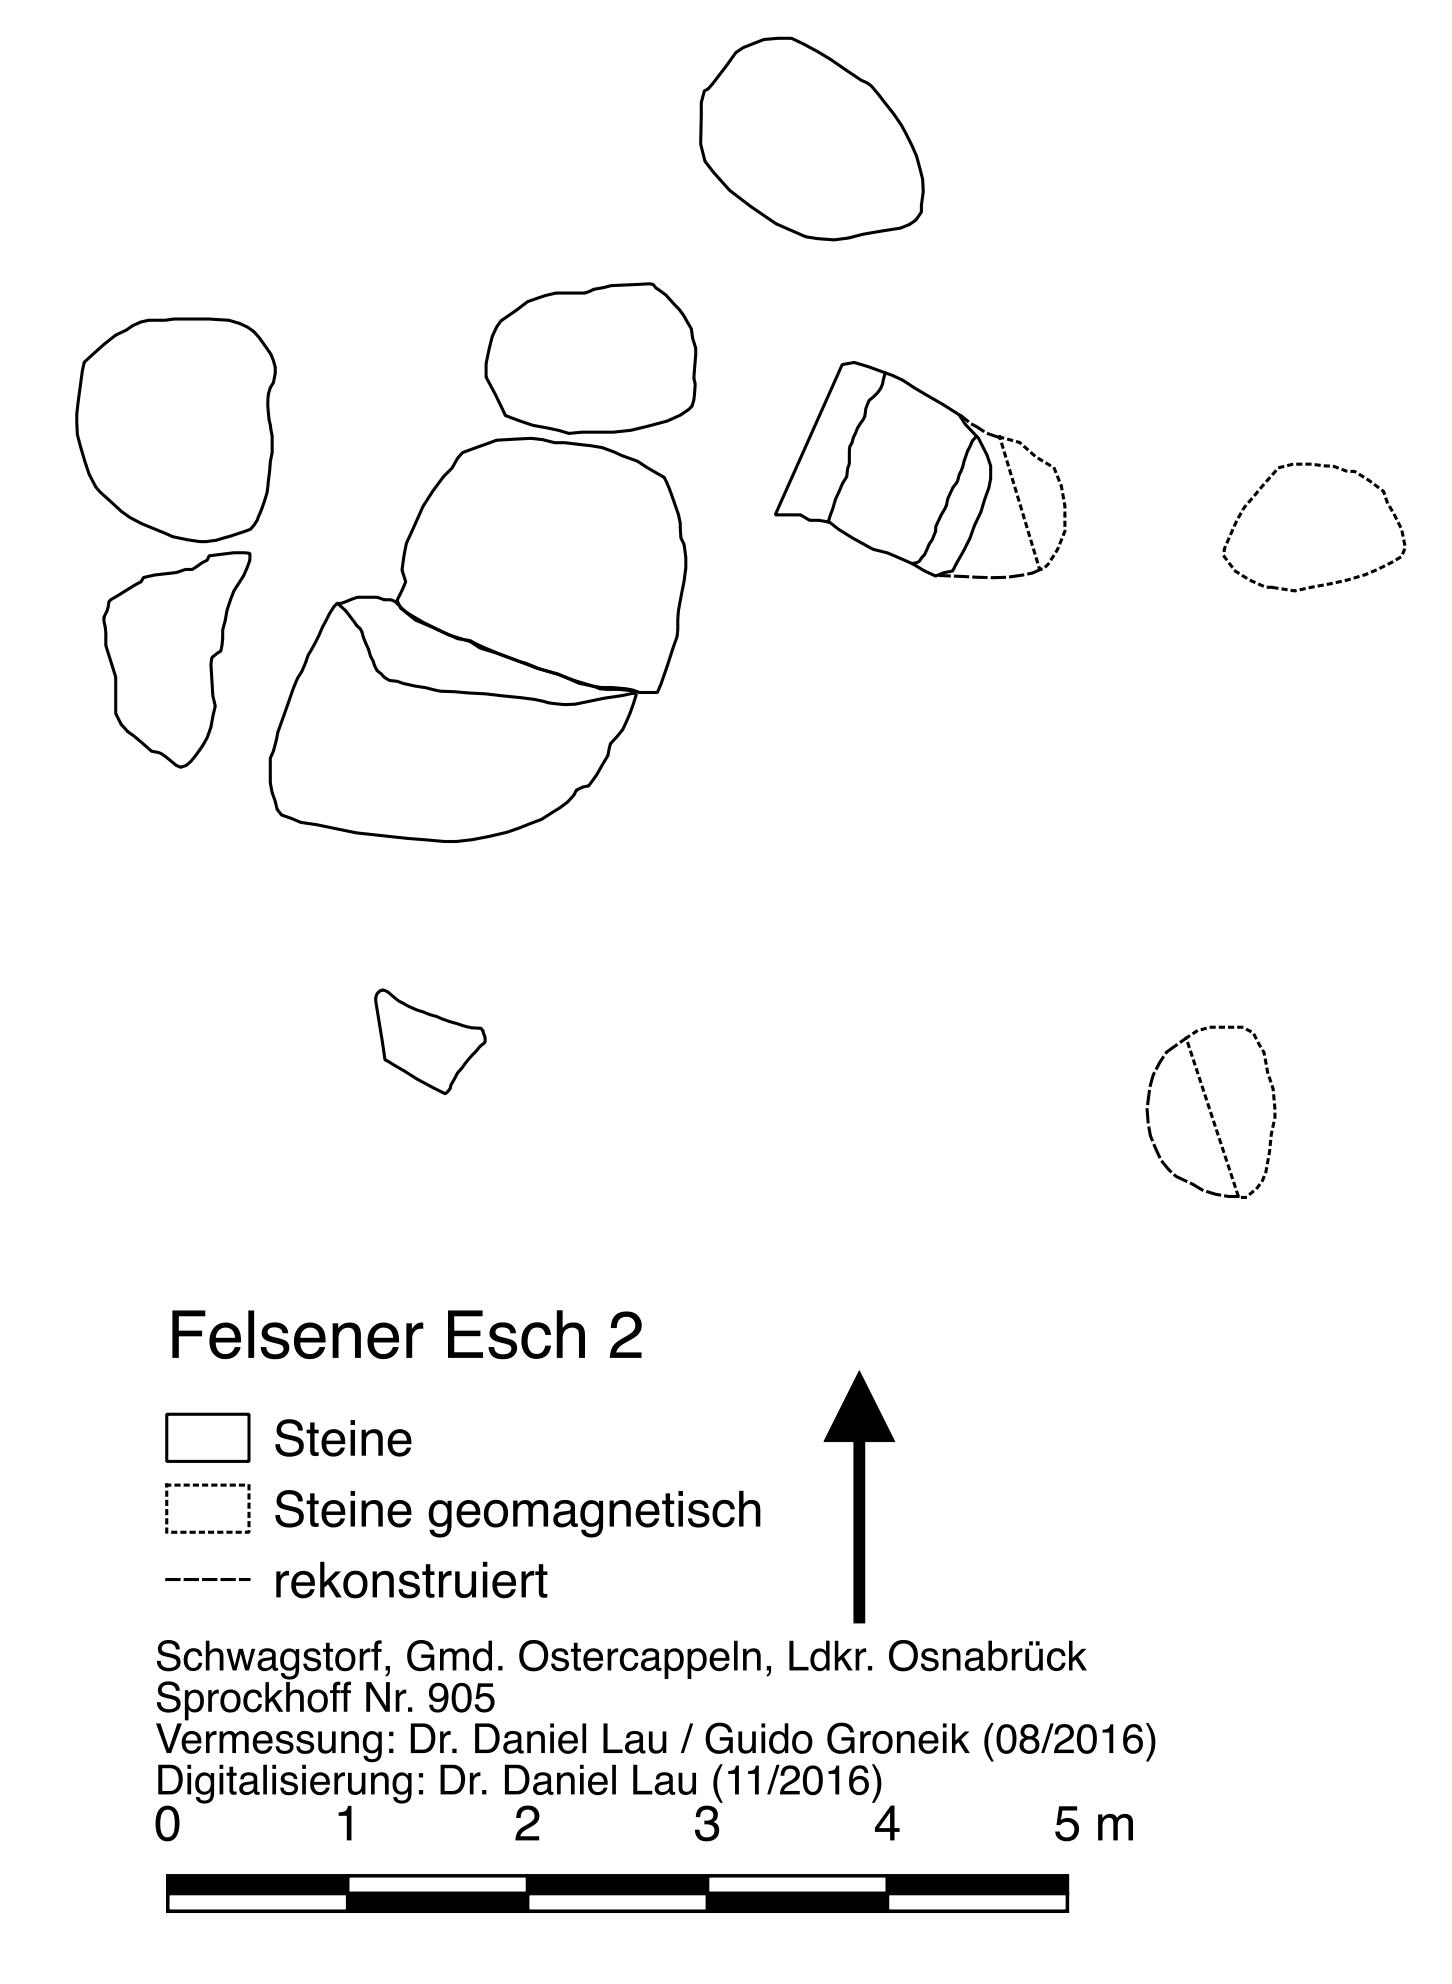 Vermessung (8/2016)